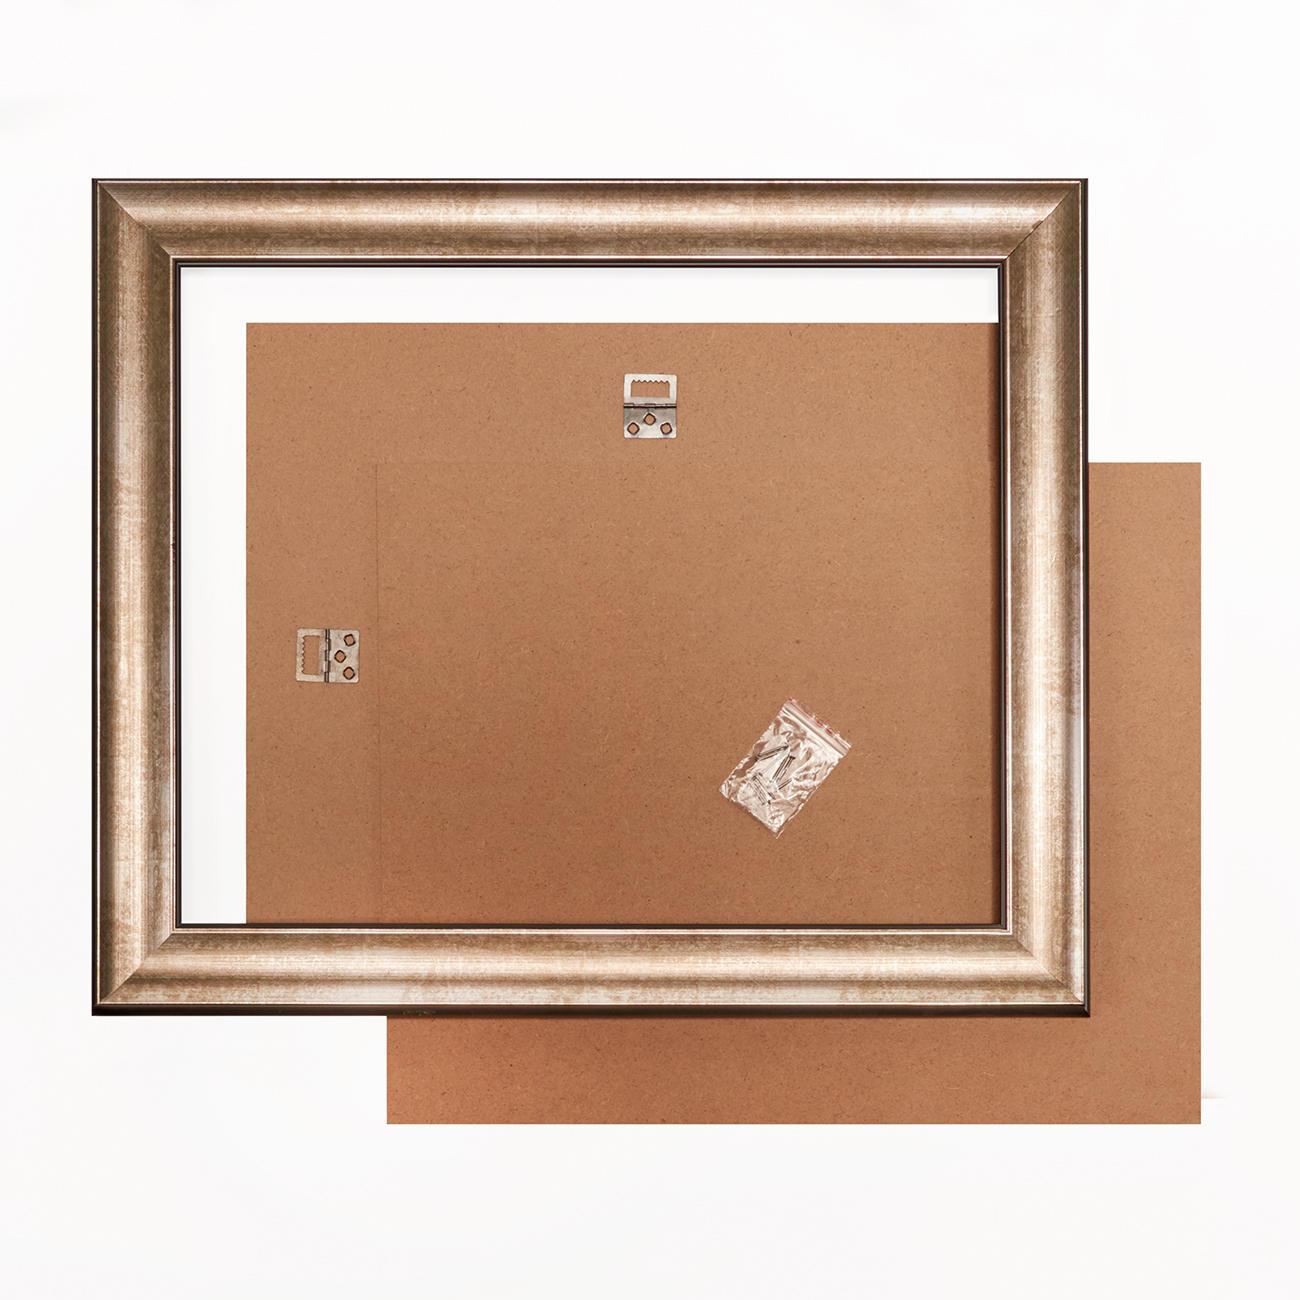 bilderrahmen dunkel silber verschiedene gr ssen. Black Bedroom Furniture Sets. Home Design Ideas